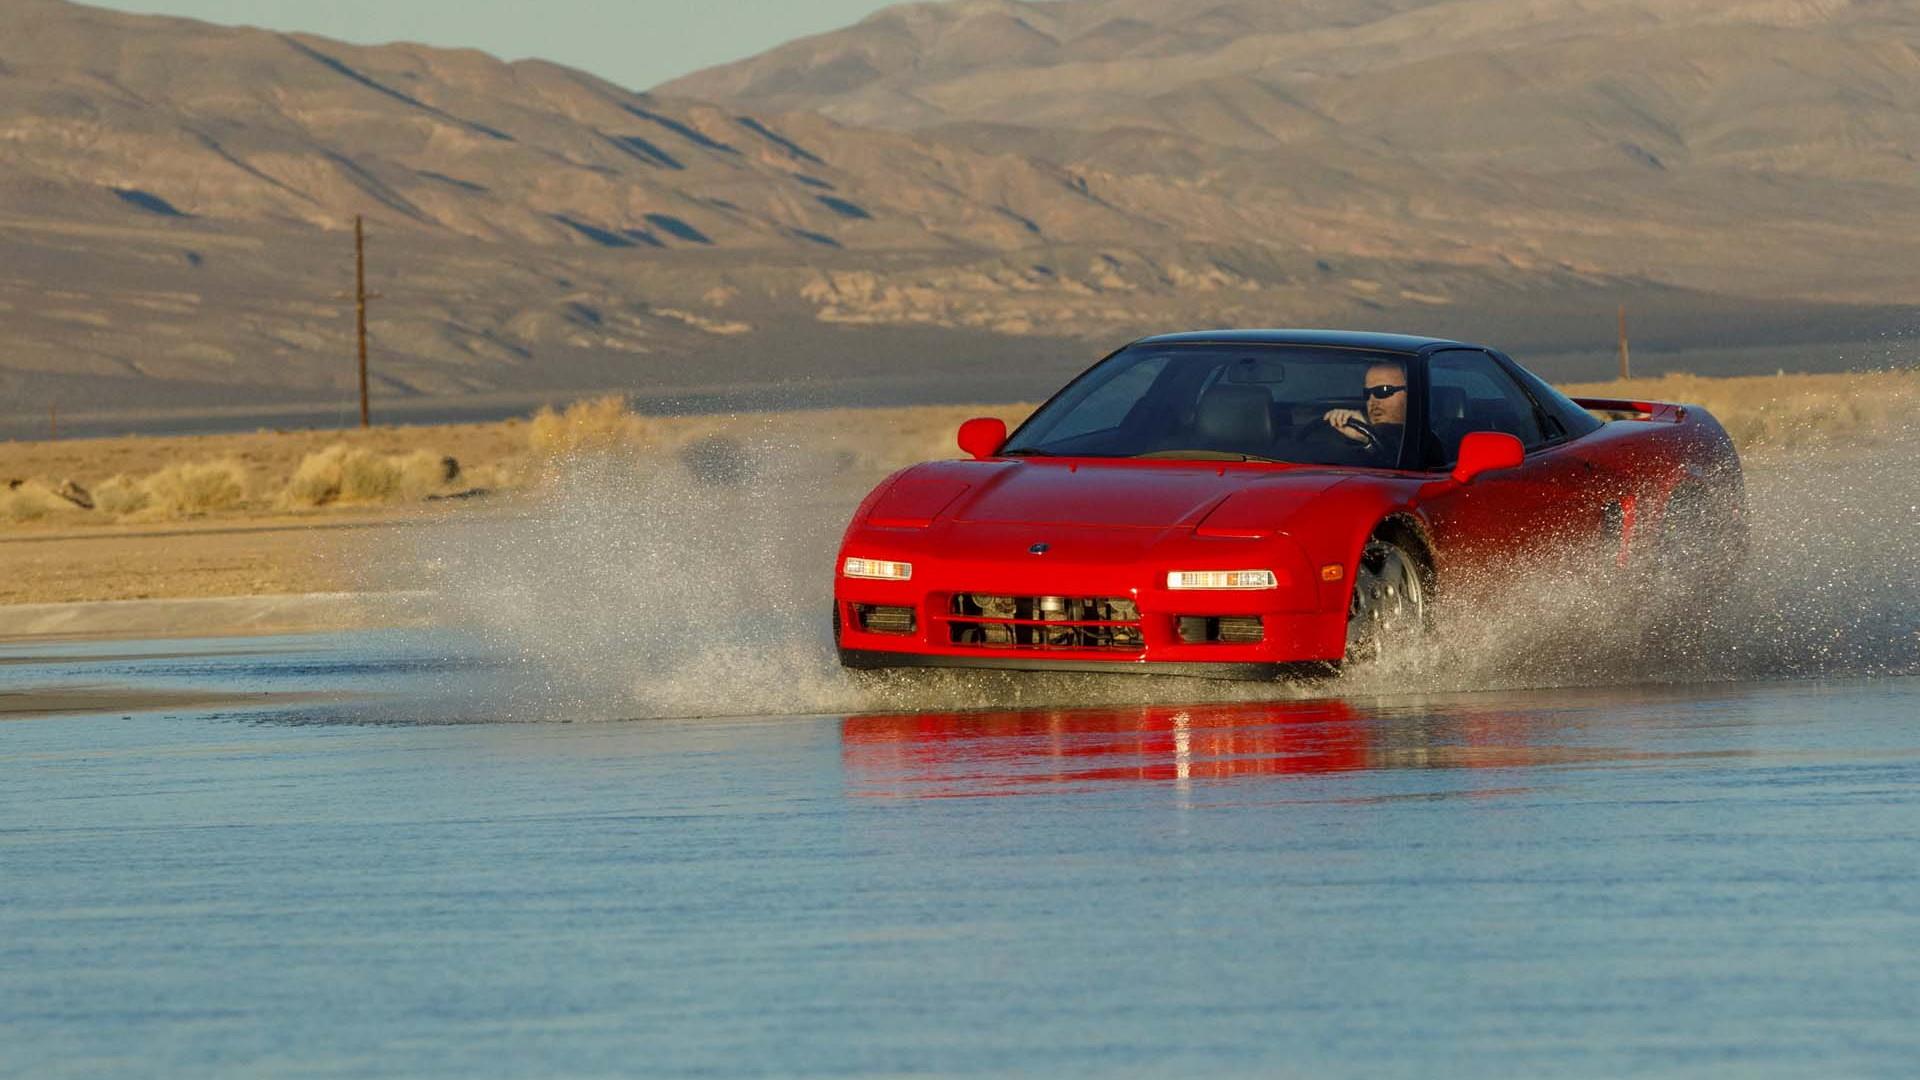 1991 Acura NSX and 2019 Acura NSX - Acura NSX 30th Anniversary